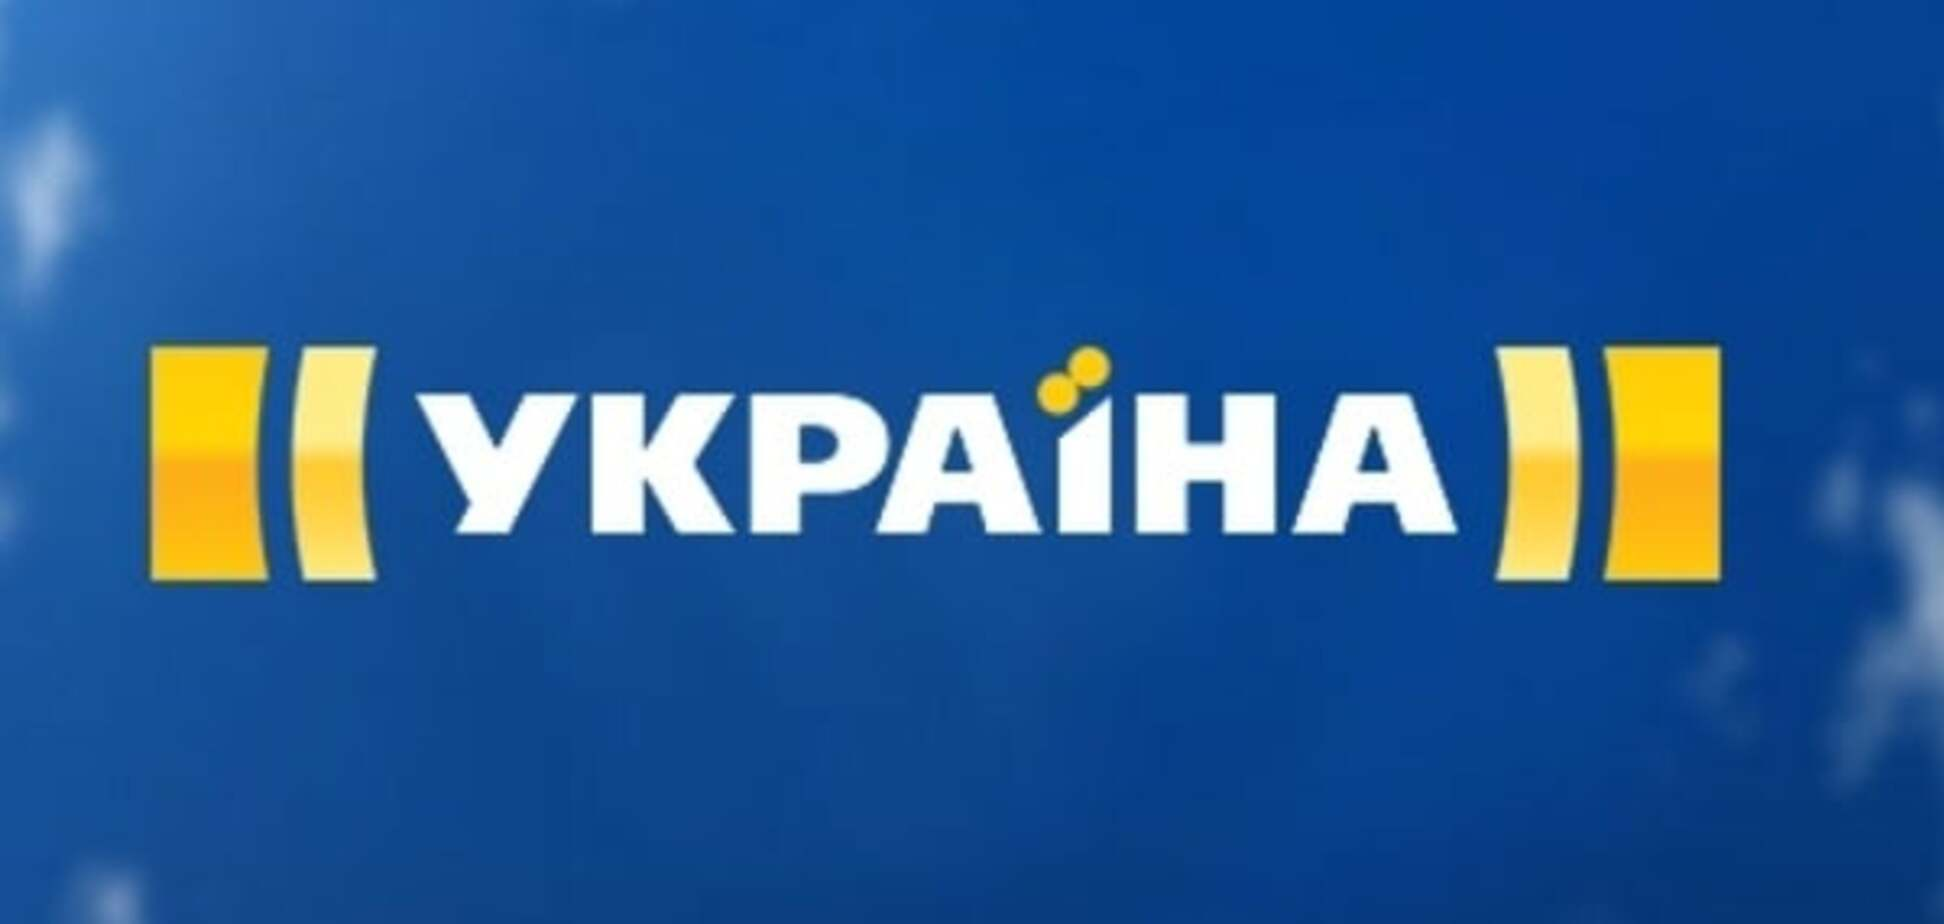 ТРК \'Украина\'